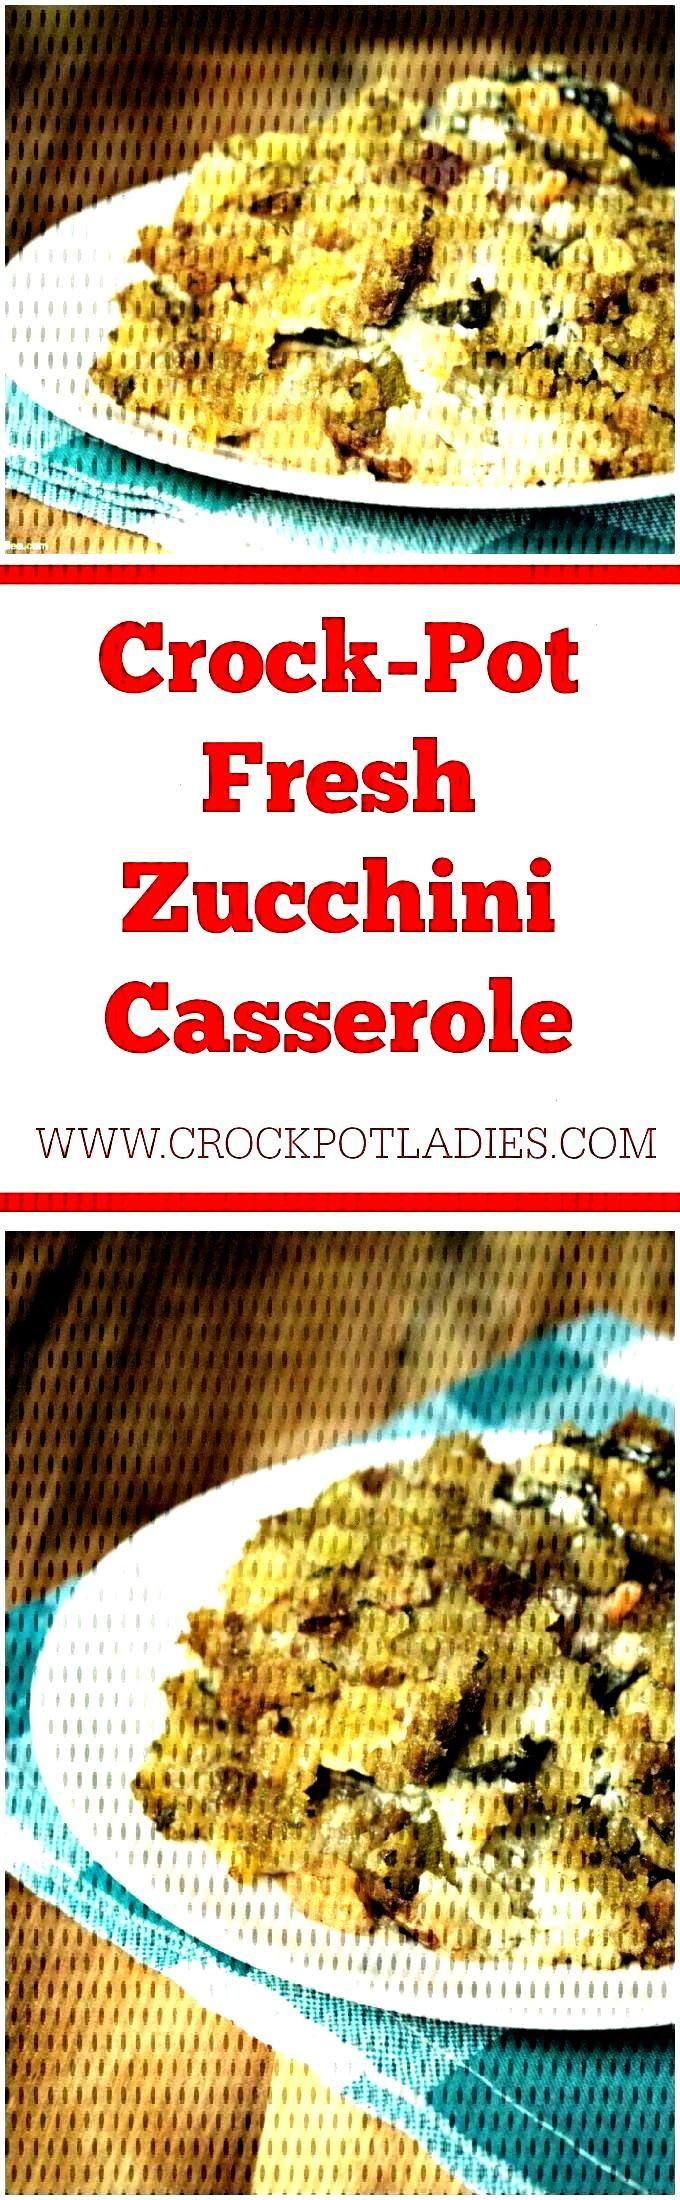 Crock-Pot Fresh Zucchini Casserole - Is your summer garden bursting at the seams with fresh zucchin